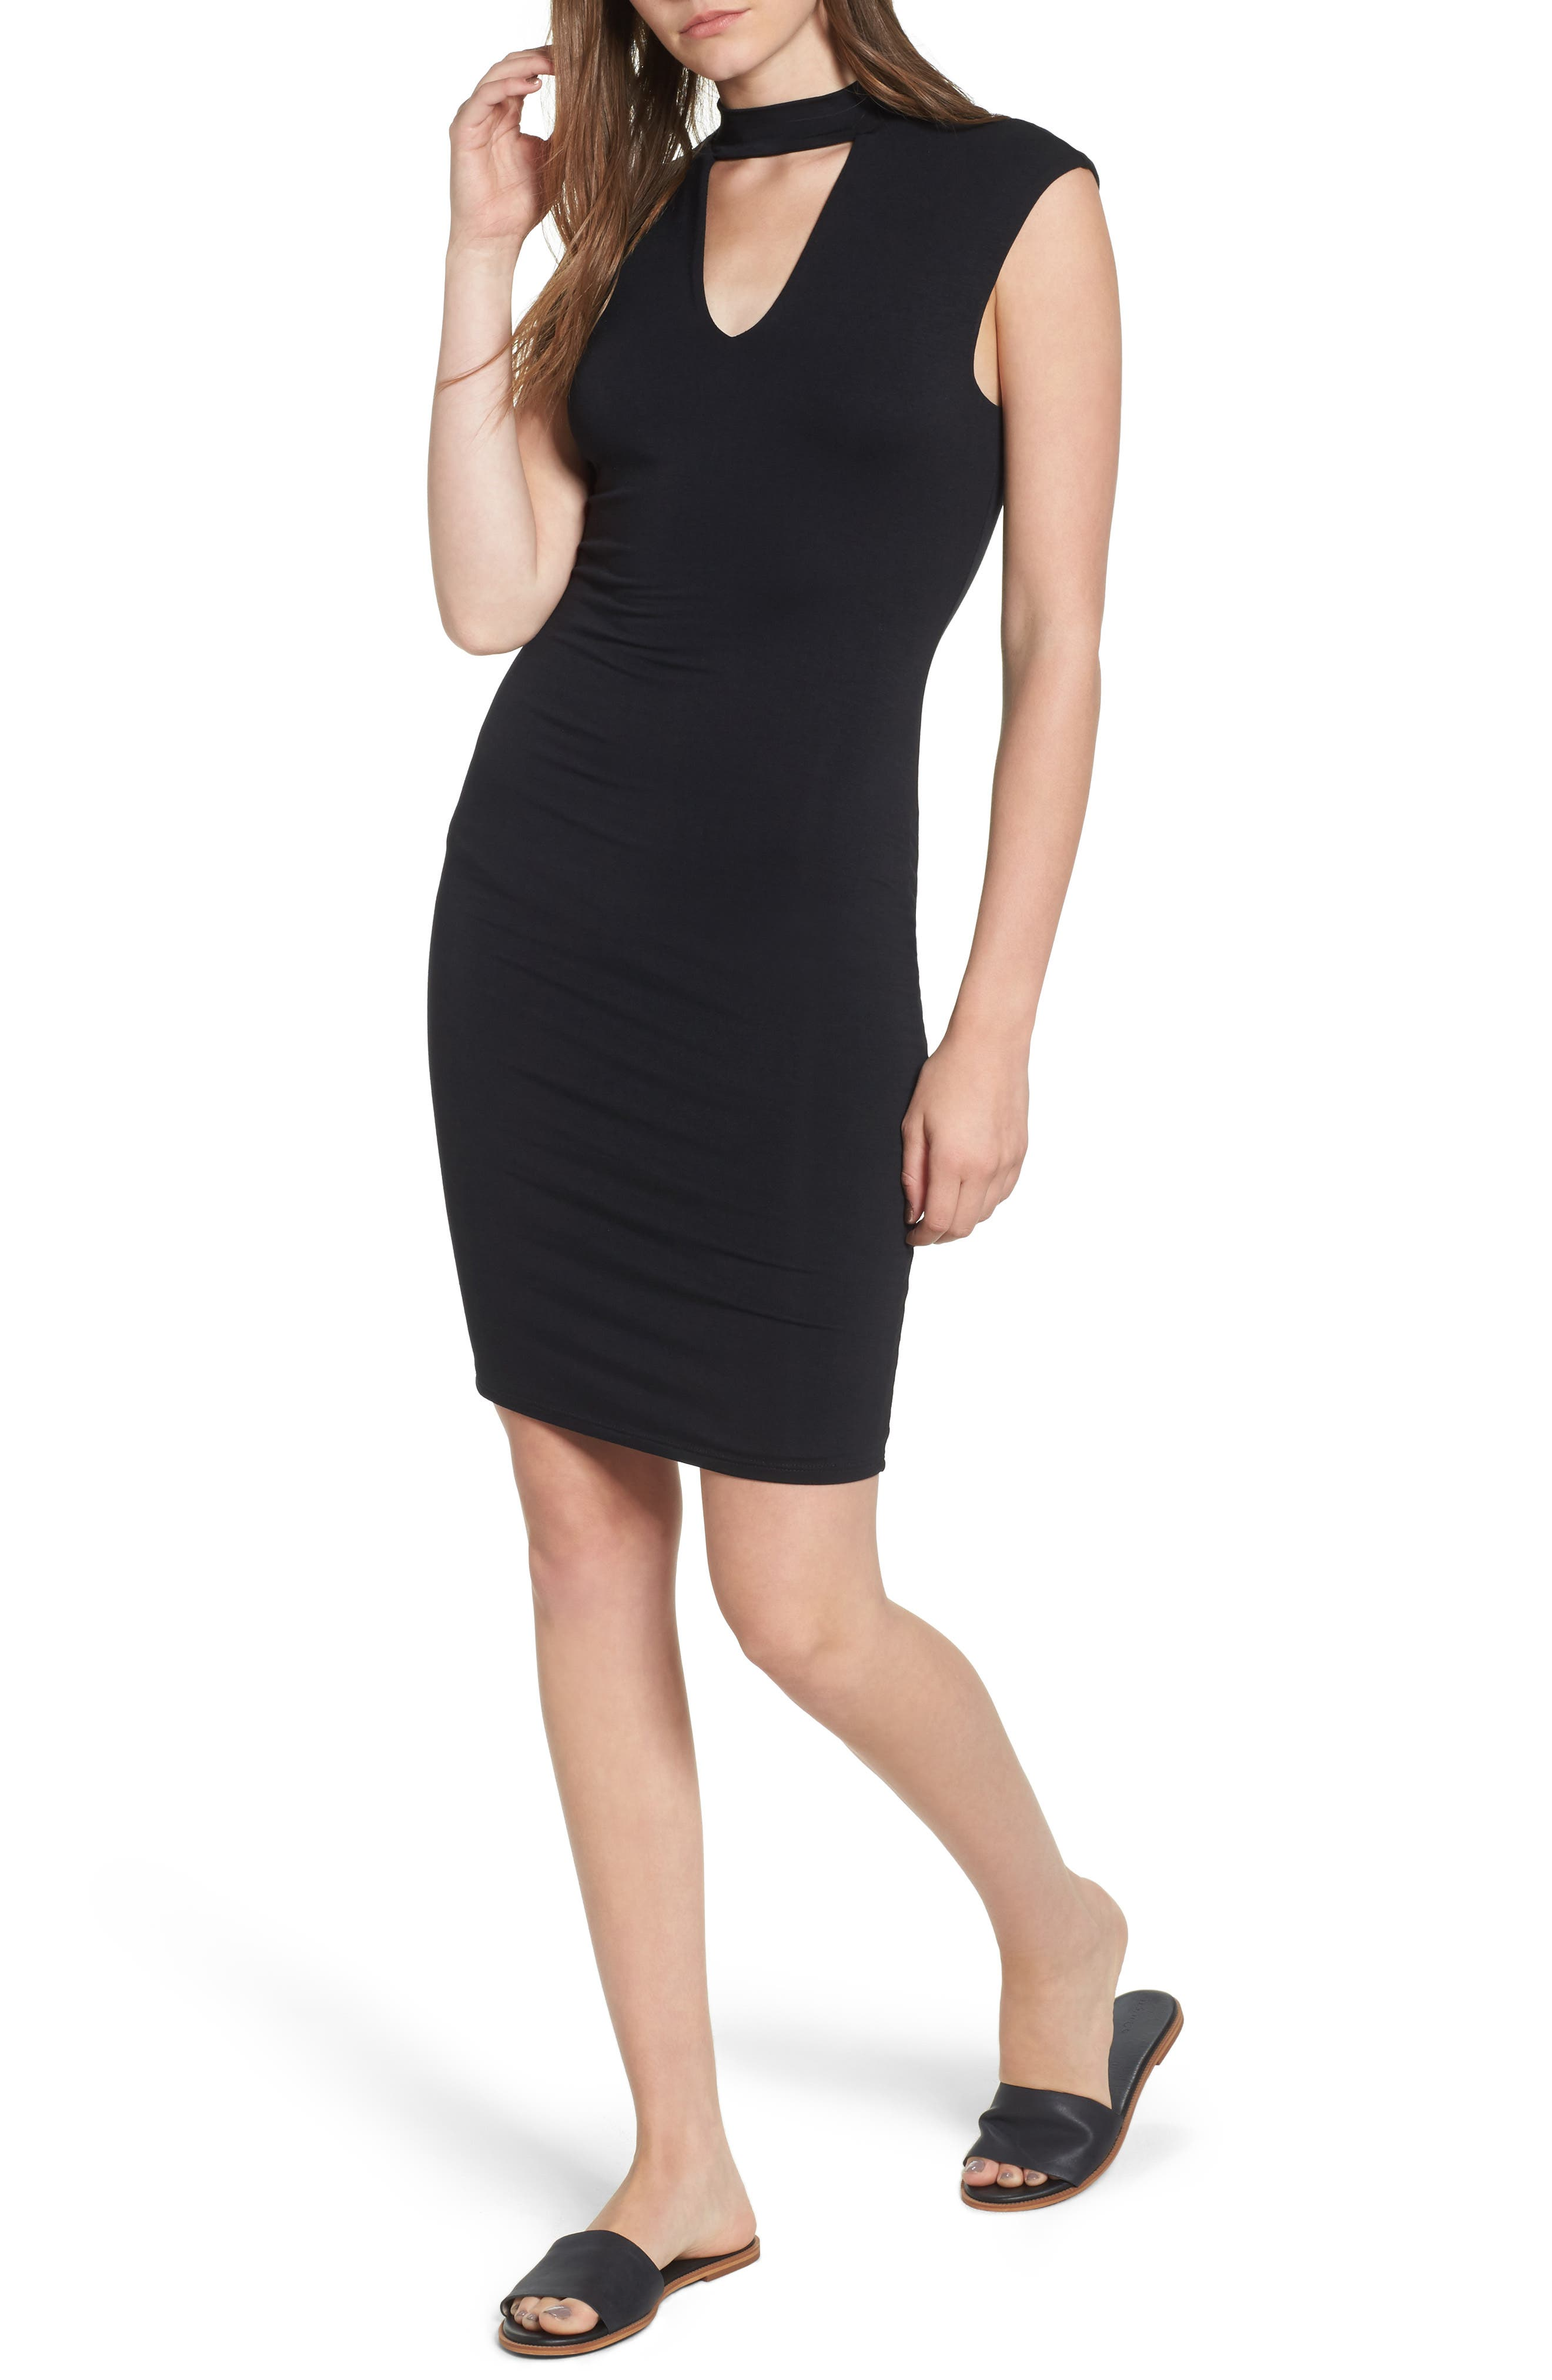 Main Image - Soprano Choker Knit Body-Con Dress